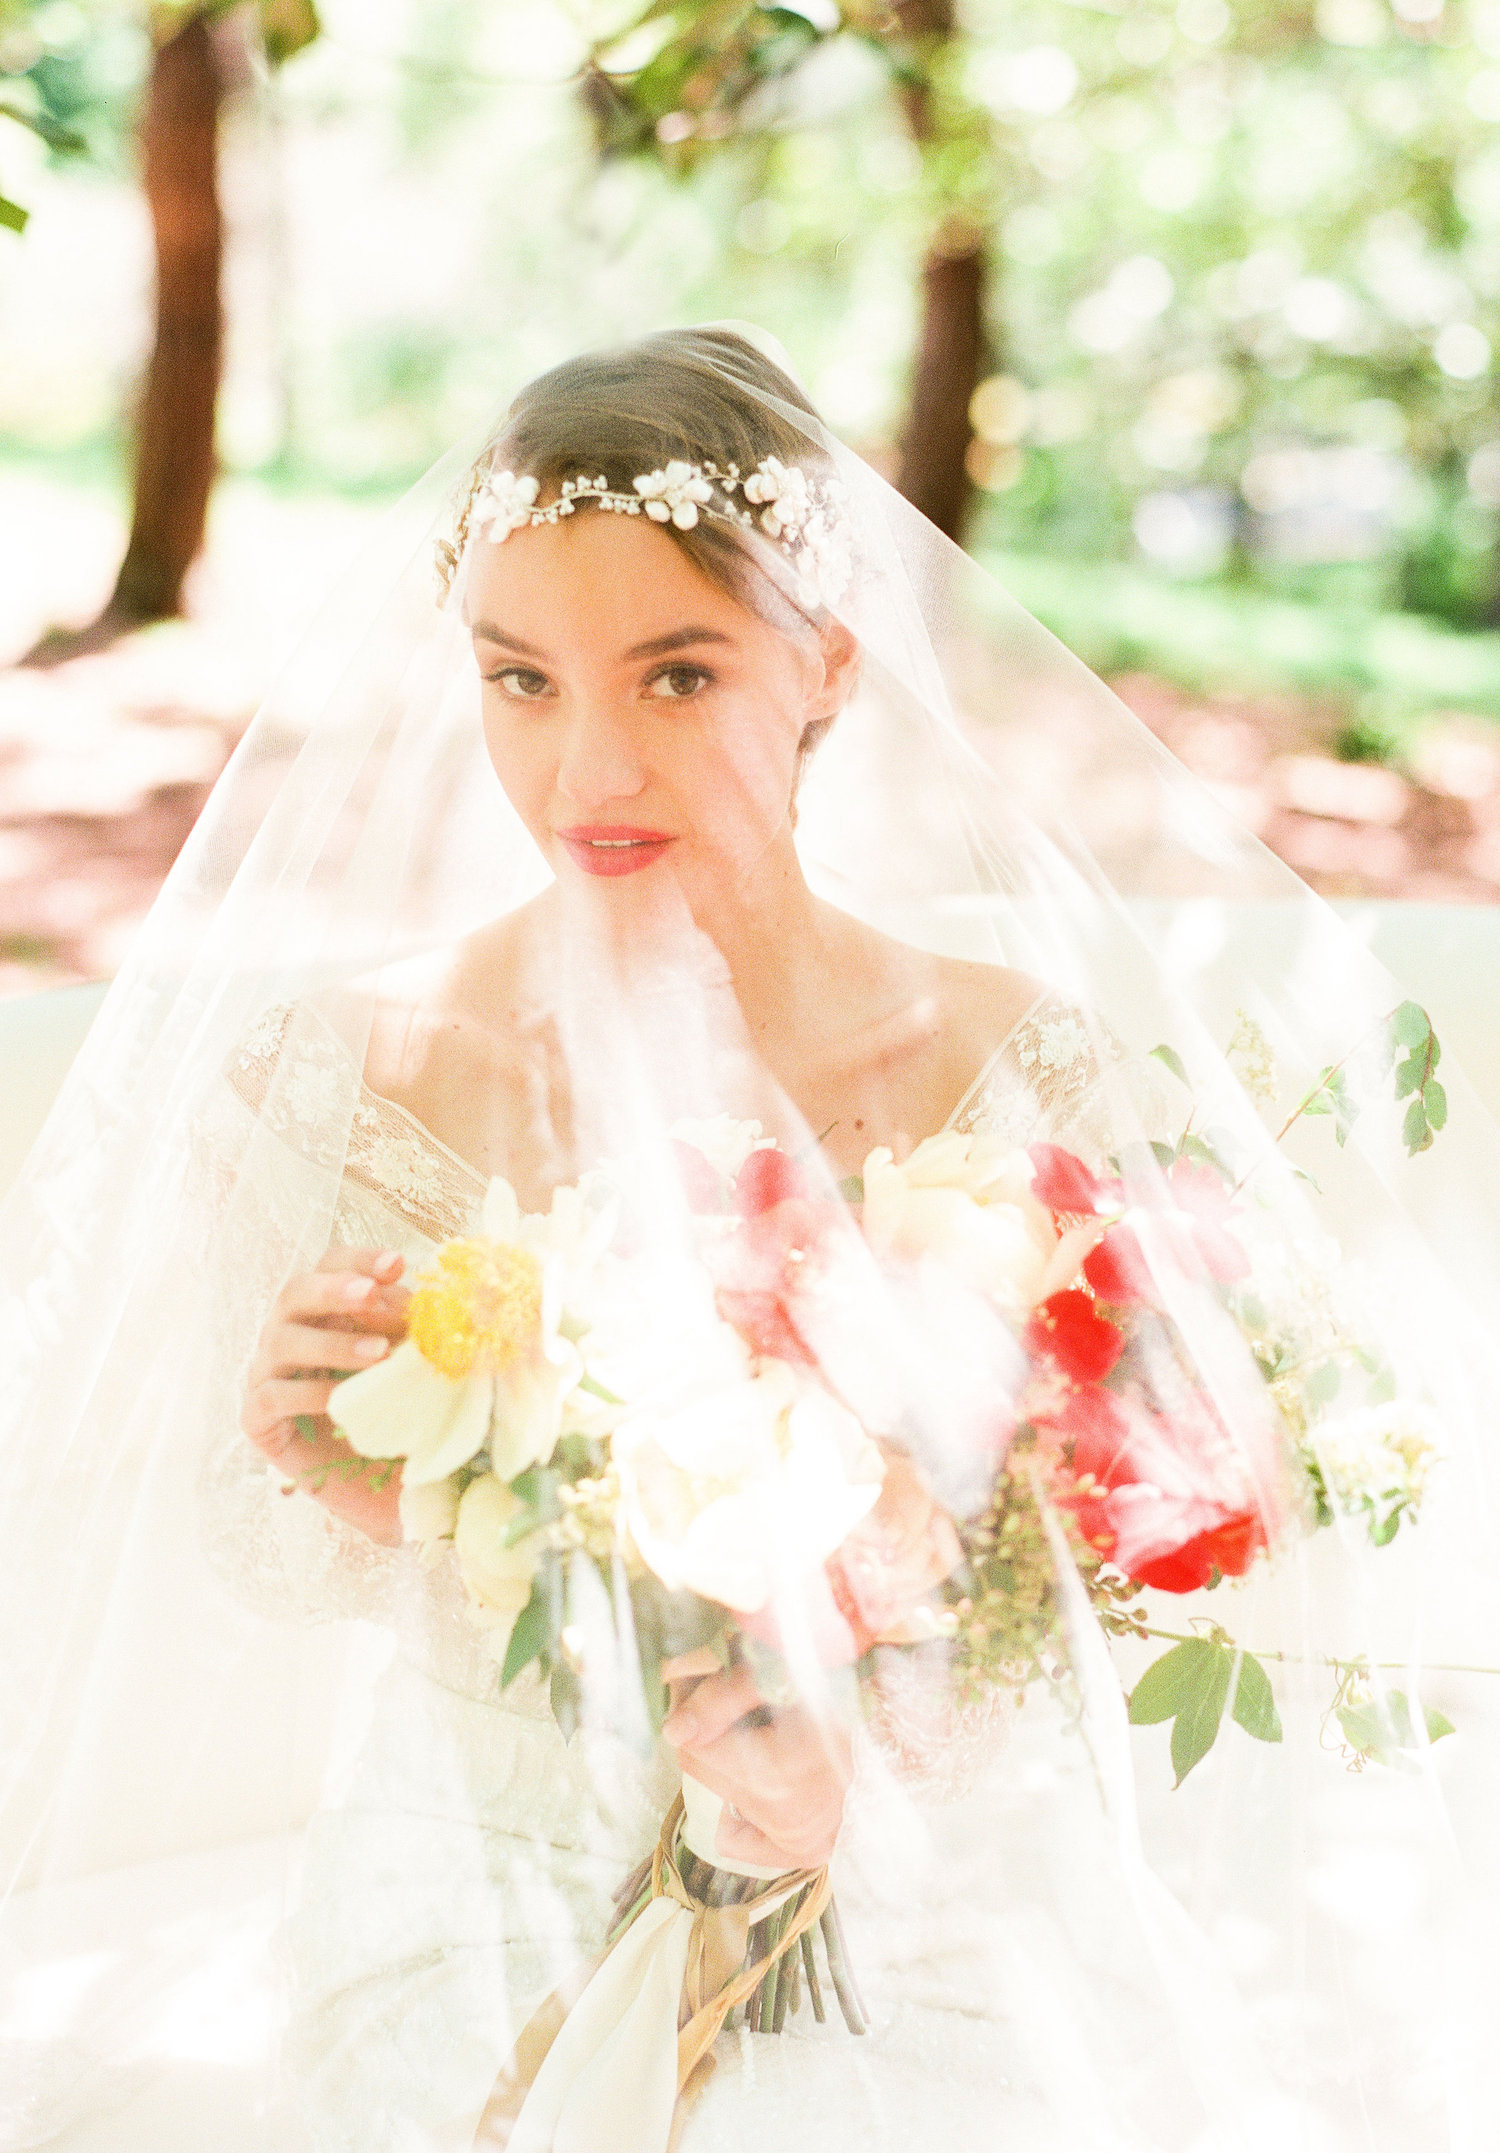 Morning Glow - Full Aperture Floral & Lindsay Madden Photography 28.jpeg